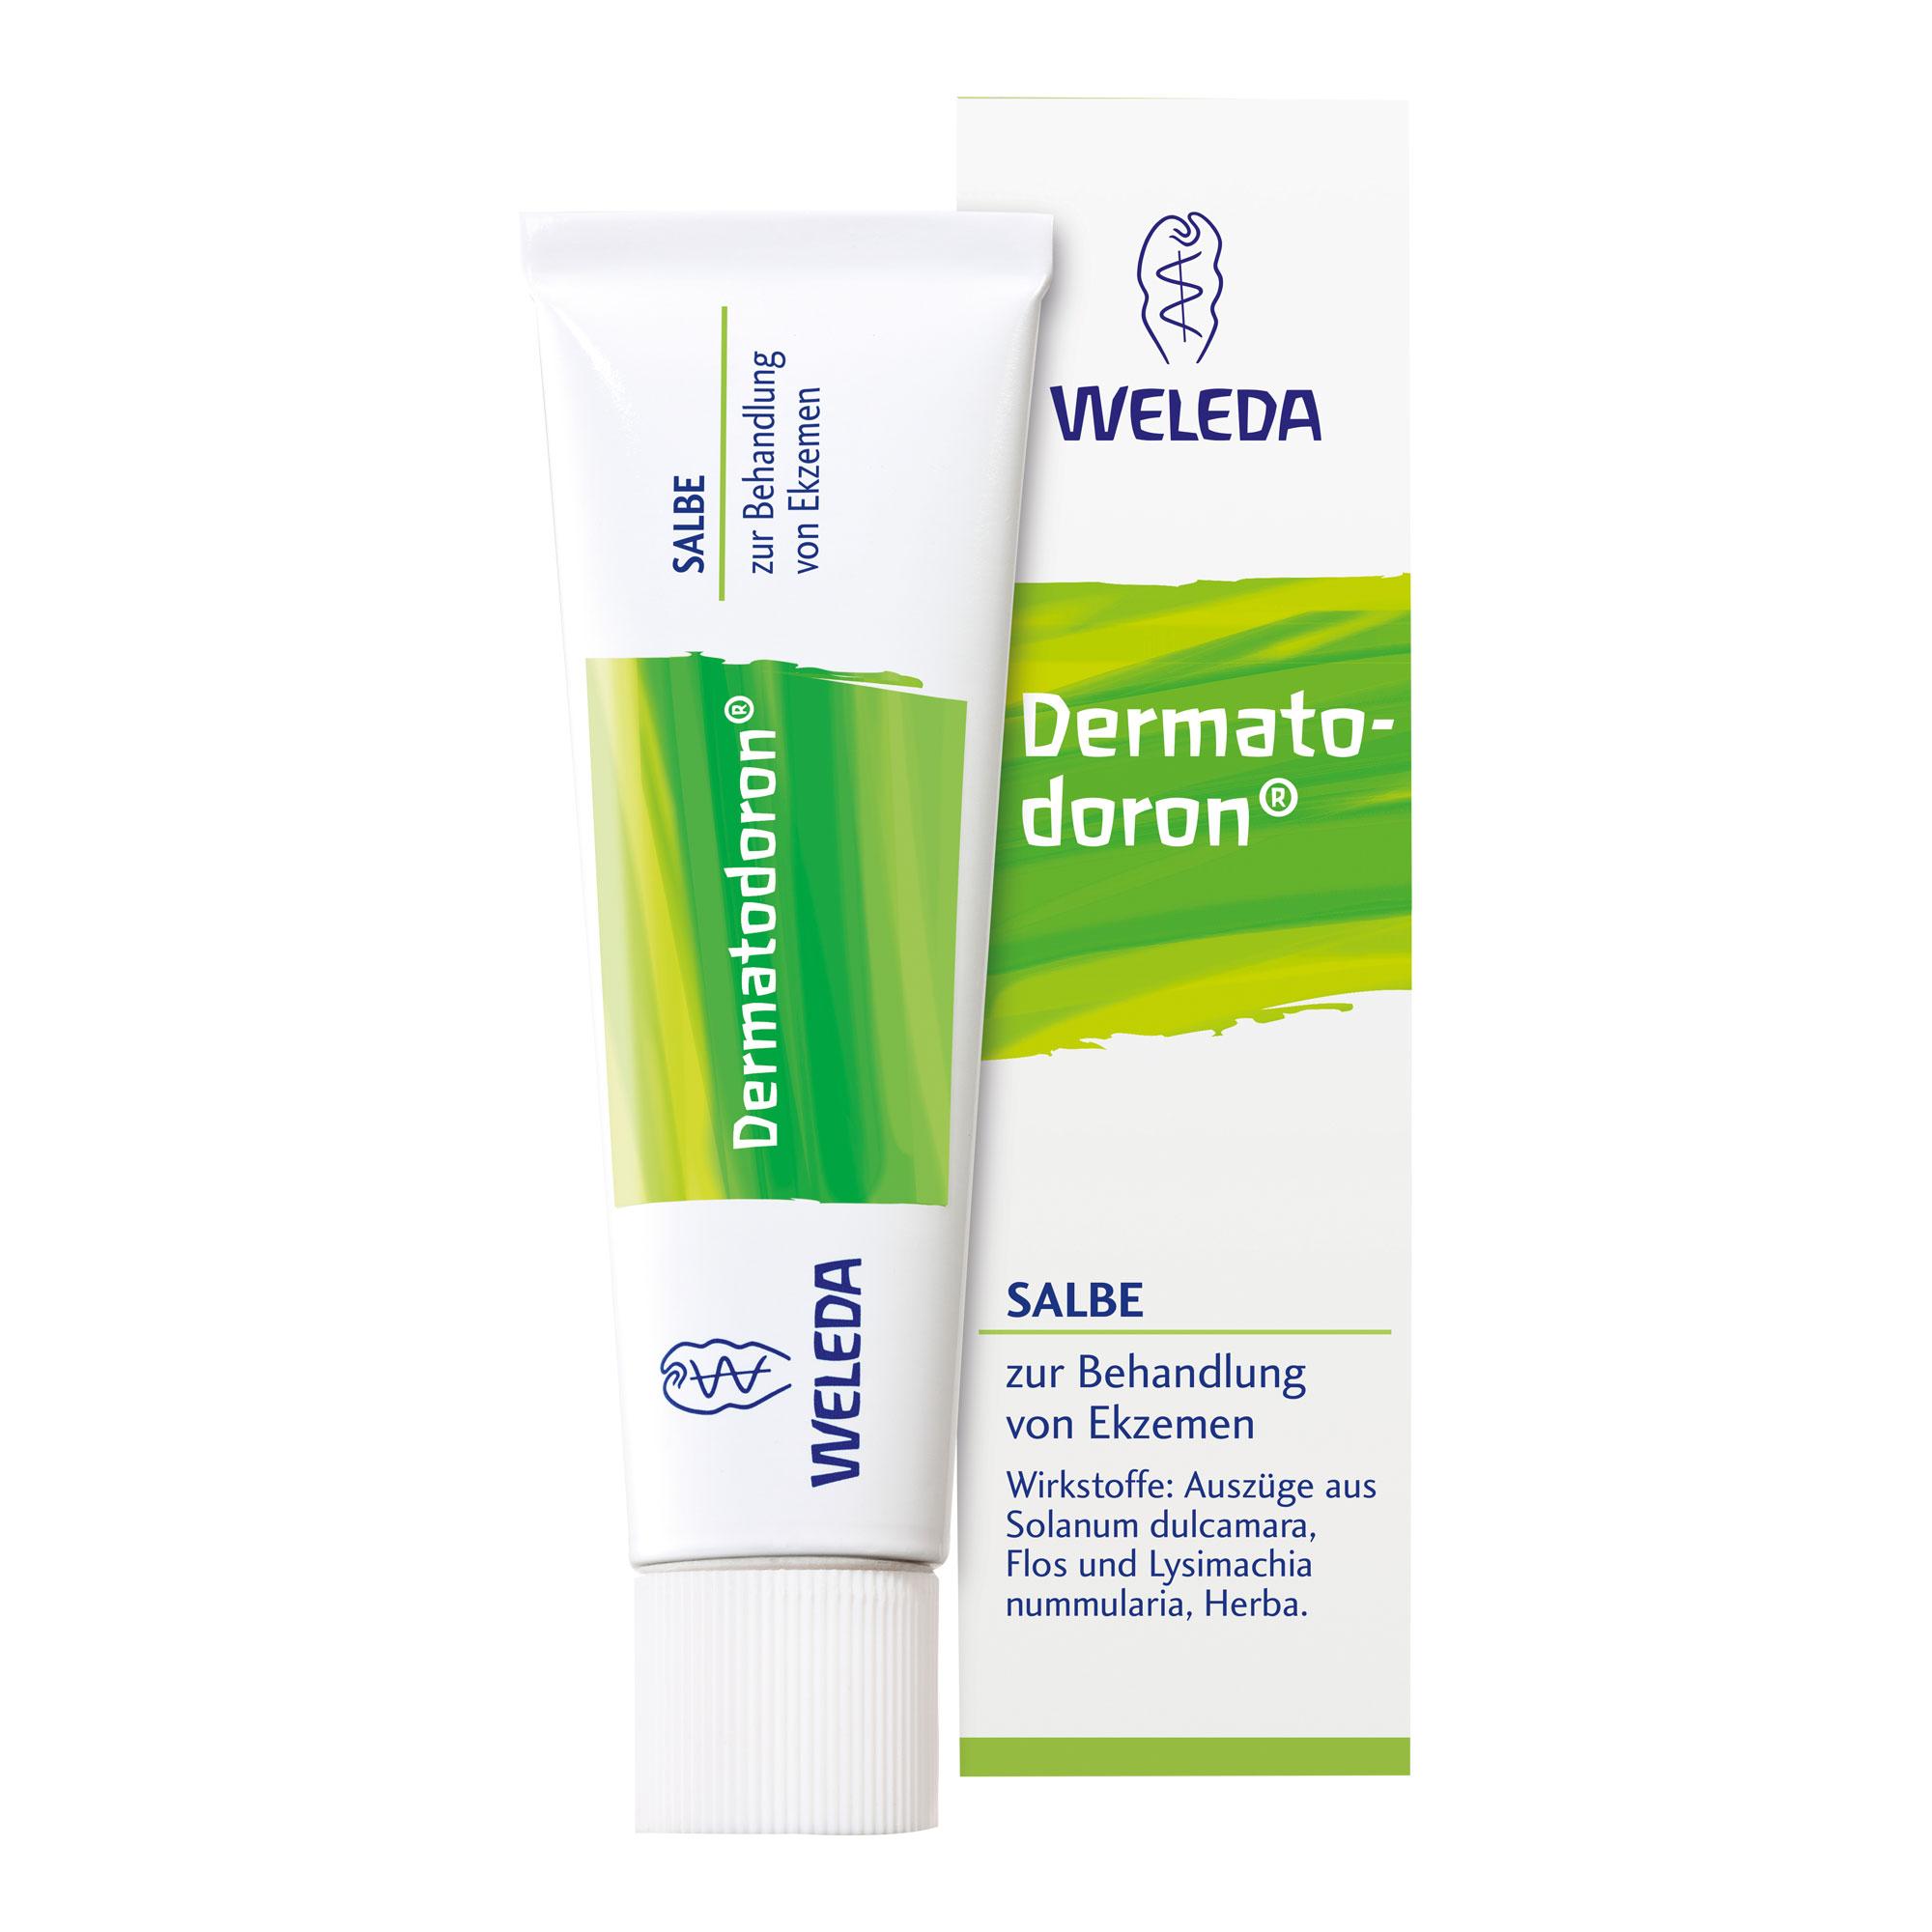 Dermatodoron Salbe